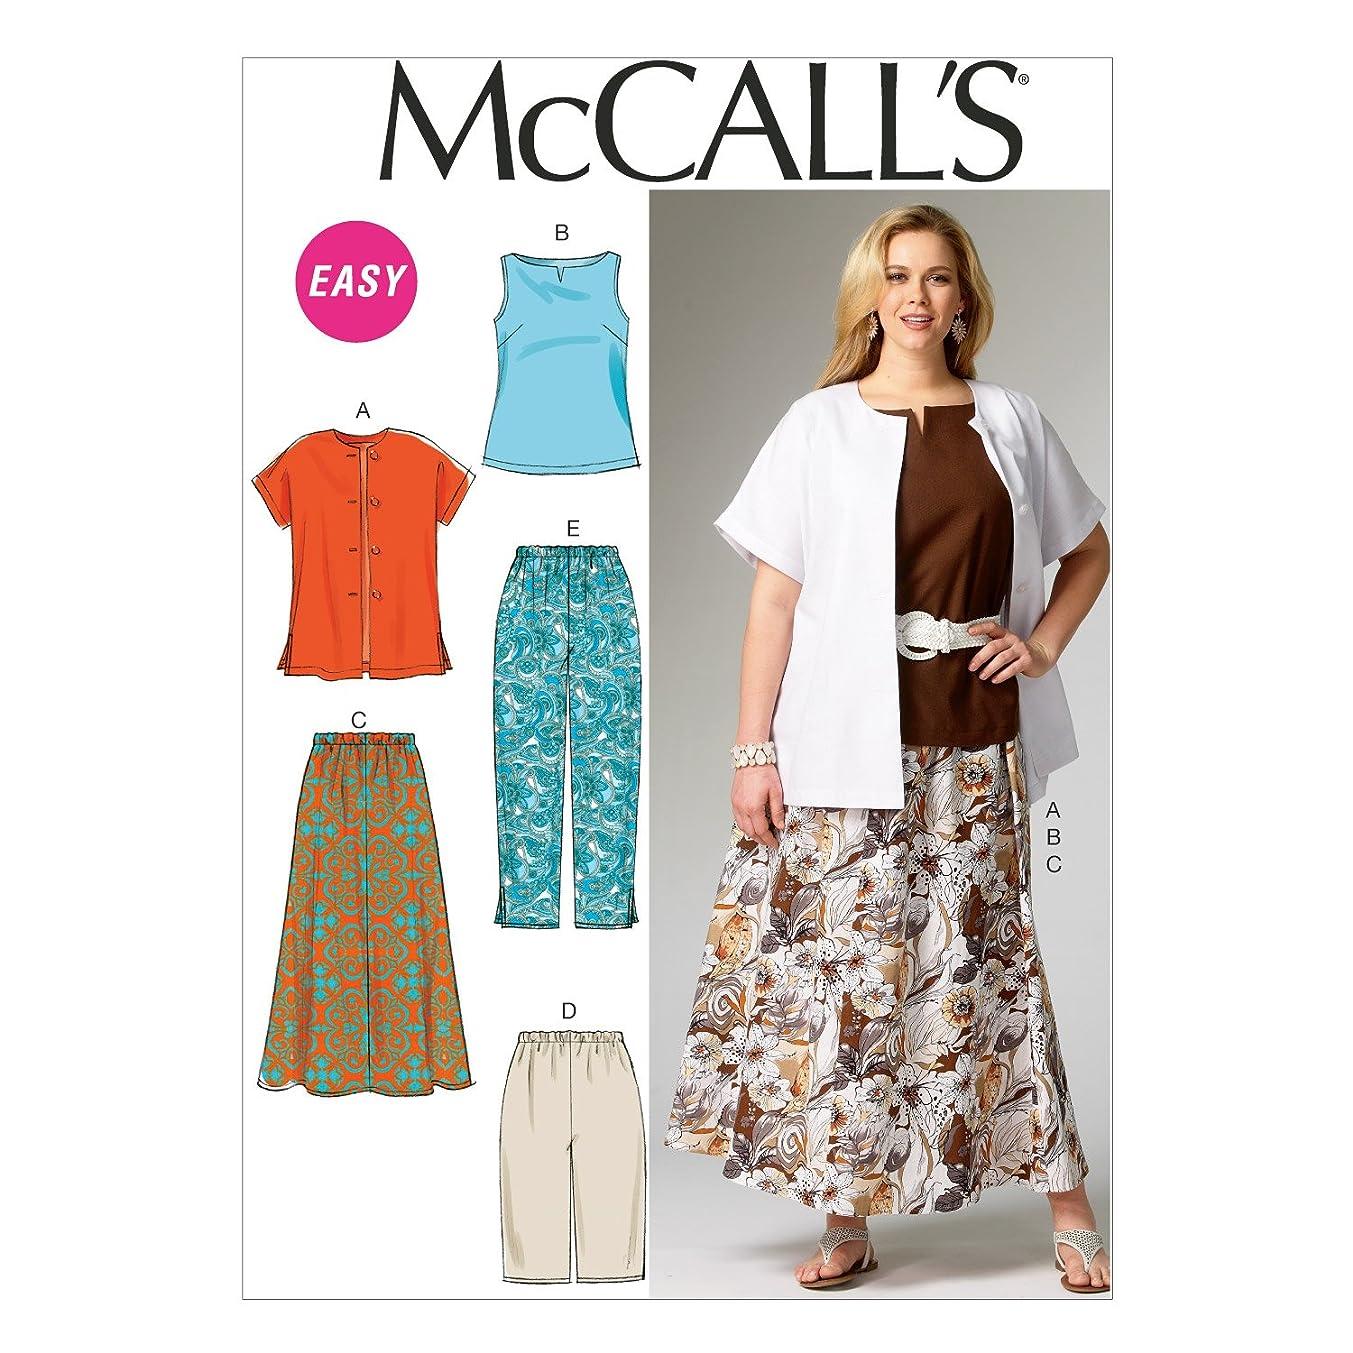 McCall Pattern Company M6970 Women's Shirt, Top, Skirt and Pants, Size KK